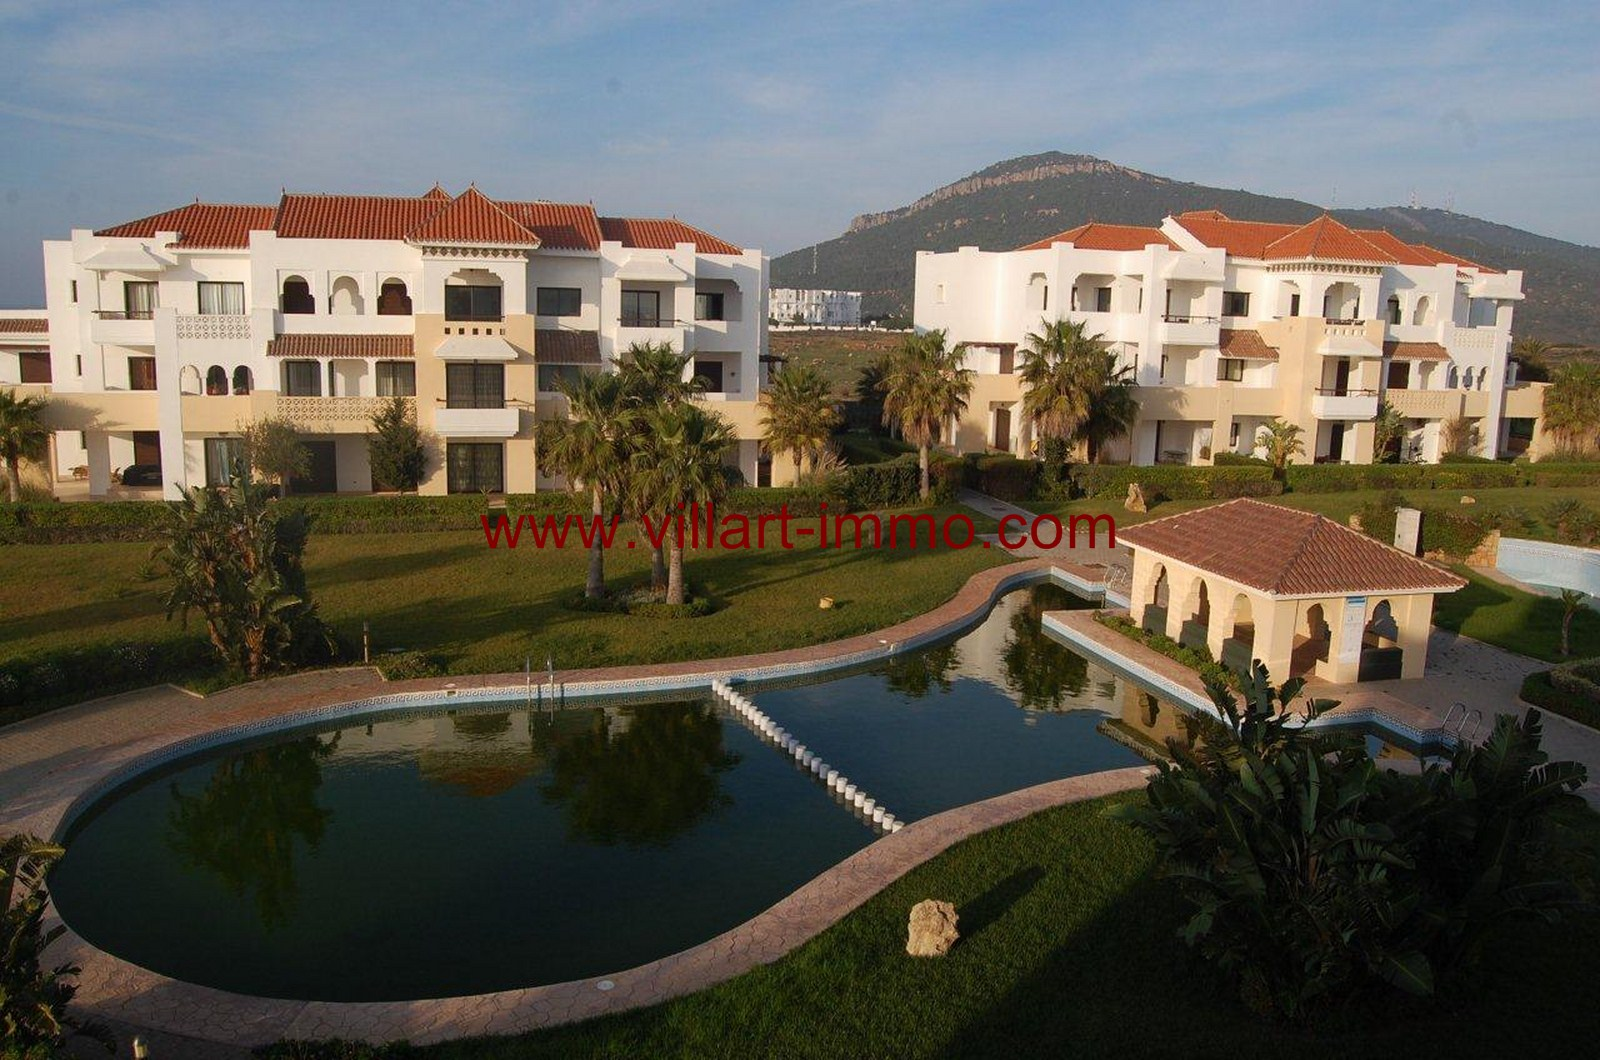 1-vente-appartement-tanger-achakar-piscine-va389-villart-immo